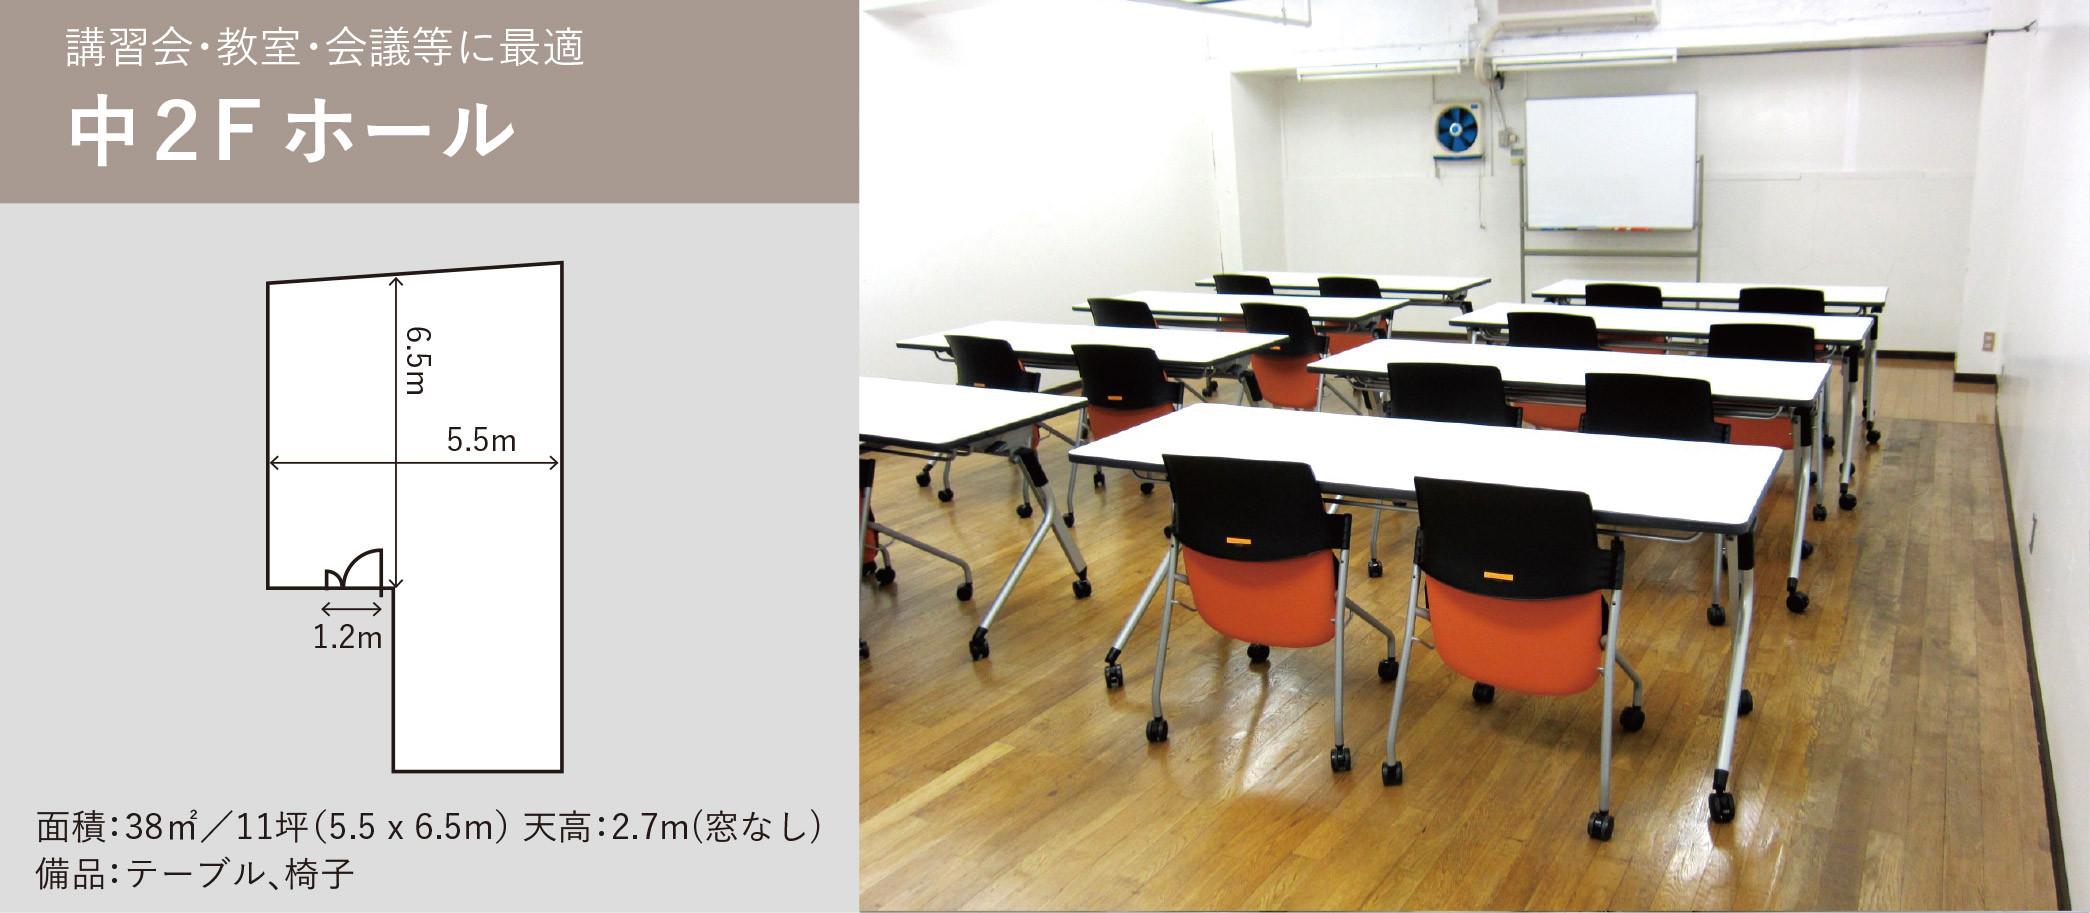 Hall_M2F-2.jpg